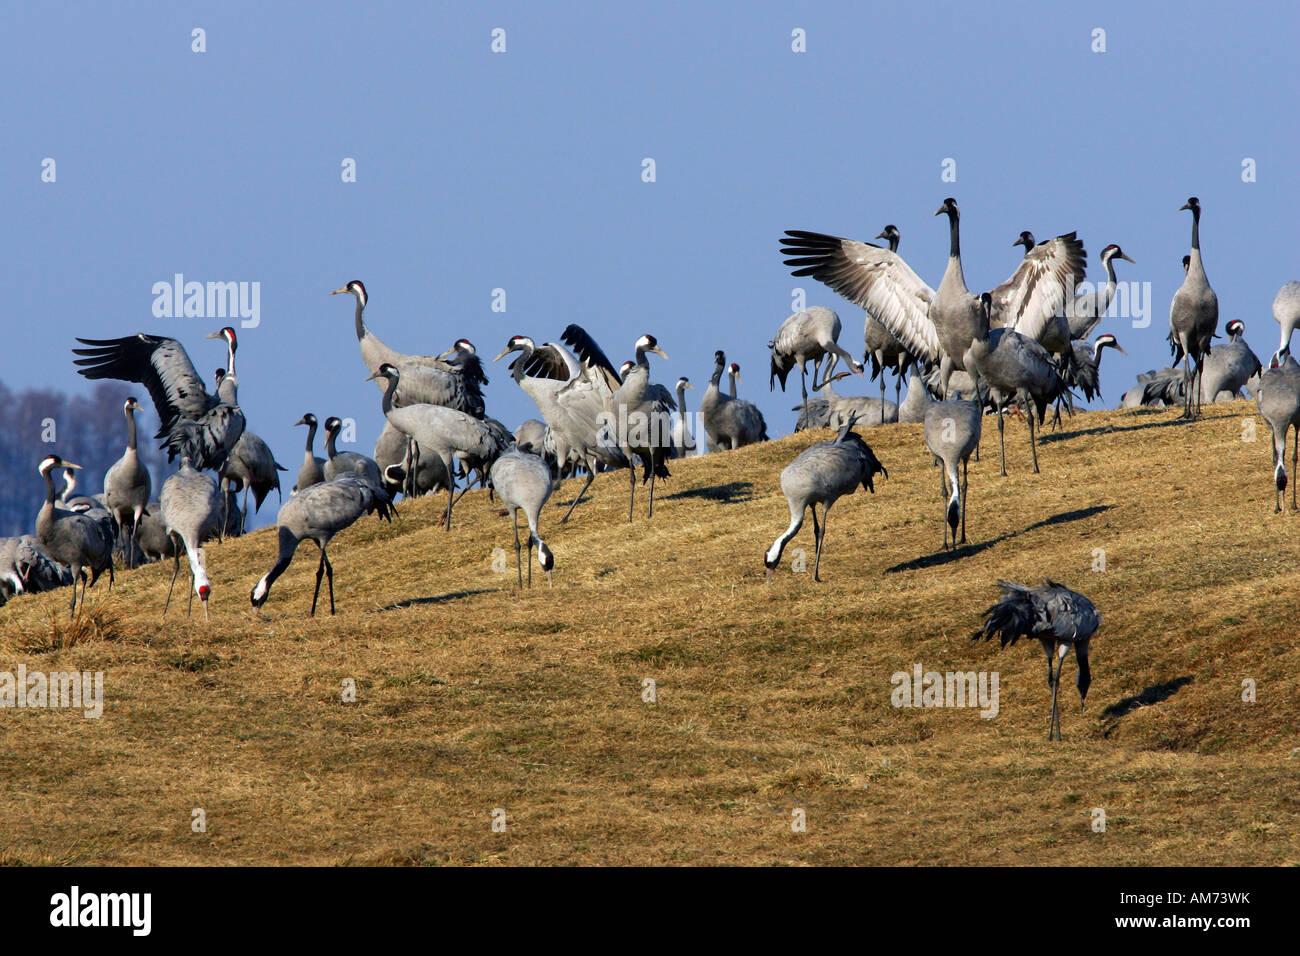 Resting common cranes (Grus grus) at the lake Hornborga in Sweden - Europe Stock Photo